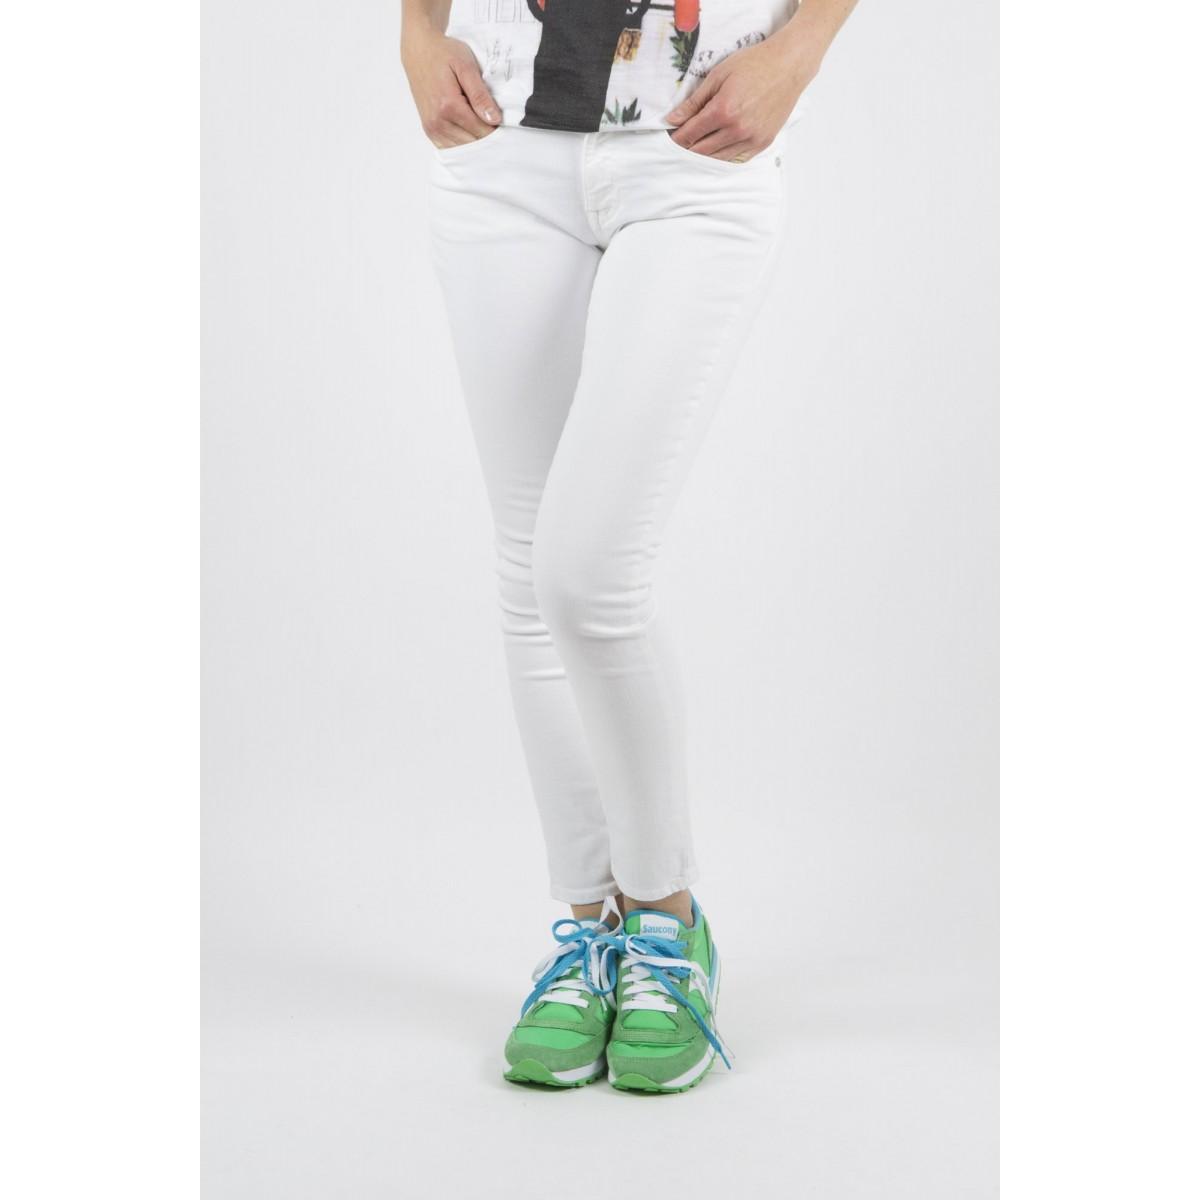 Jeans Ralph Lauren Donna - V60Ig388Bg014